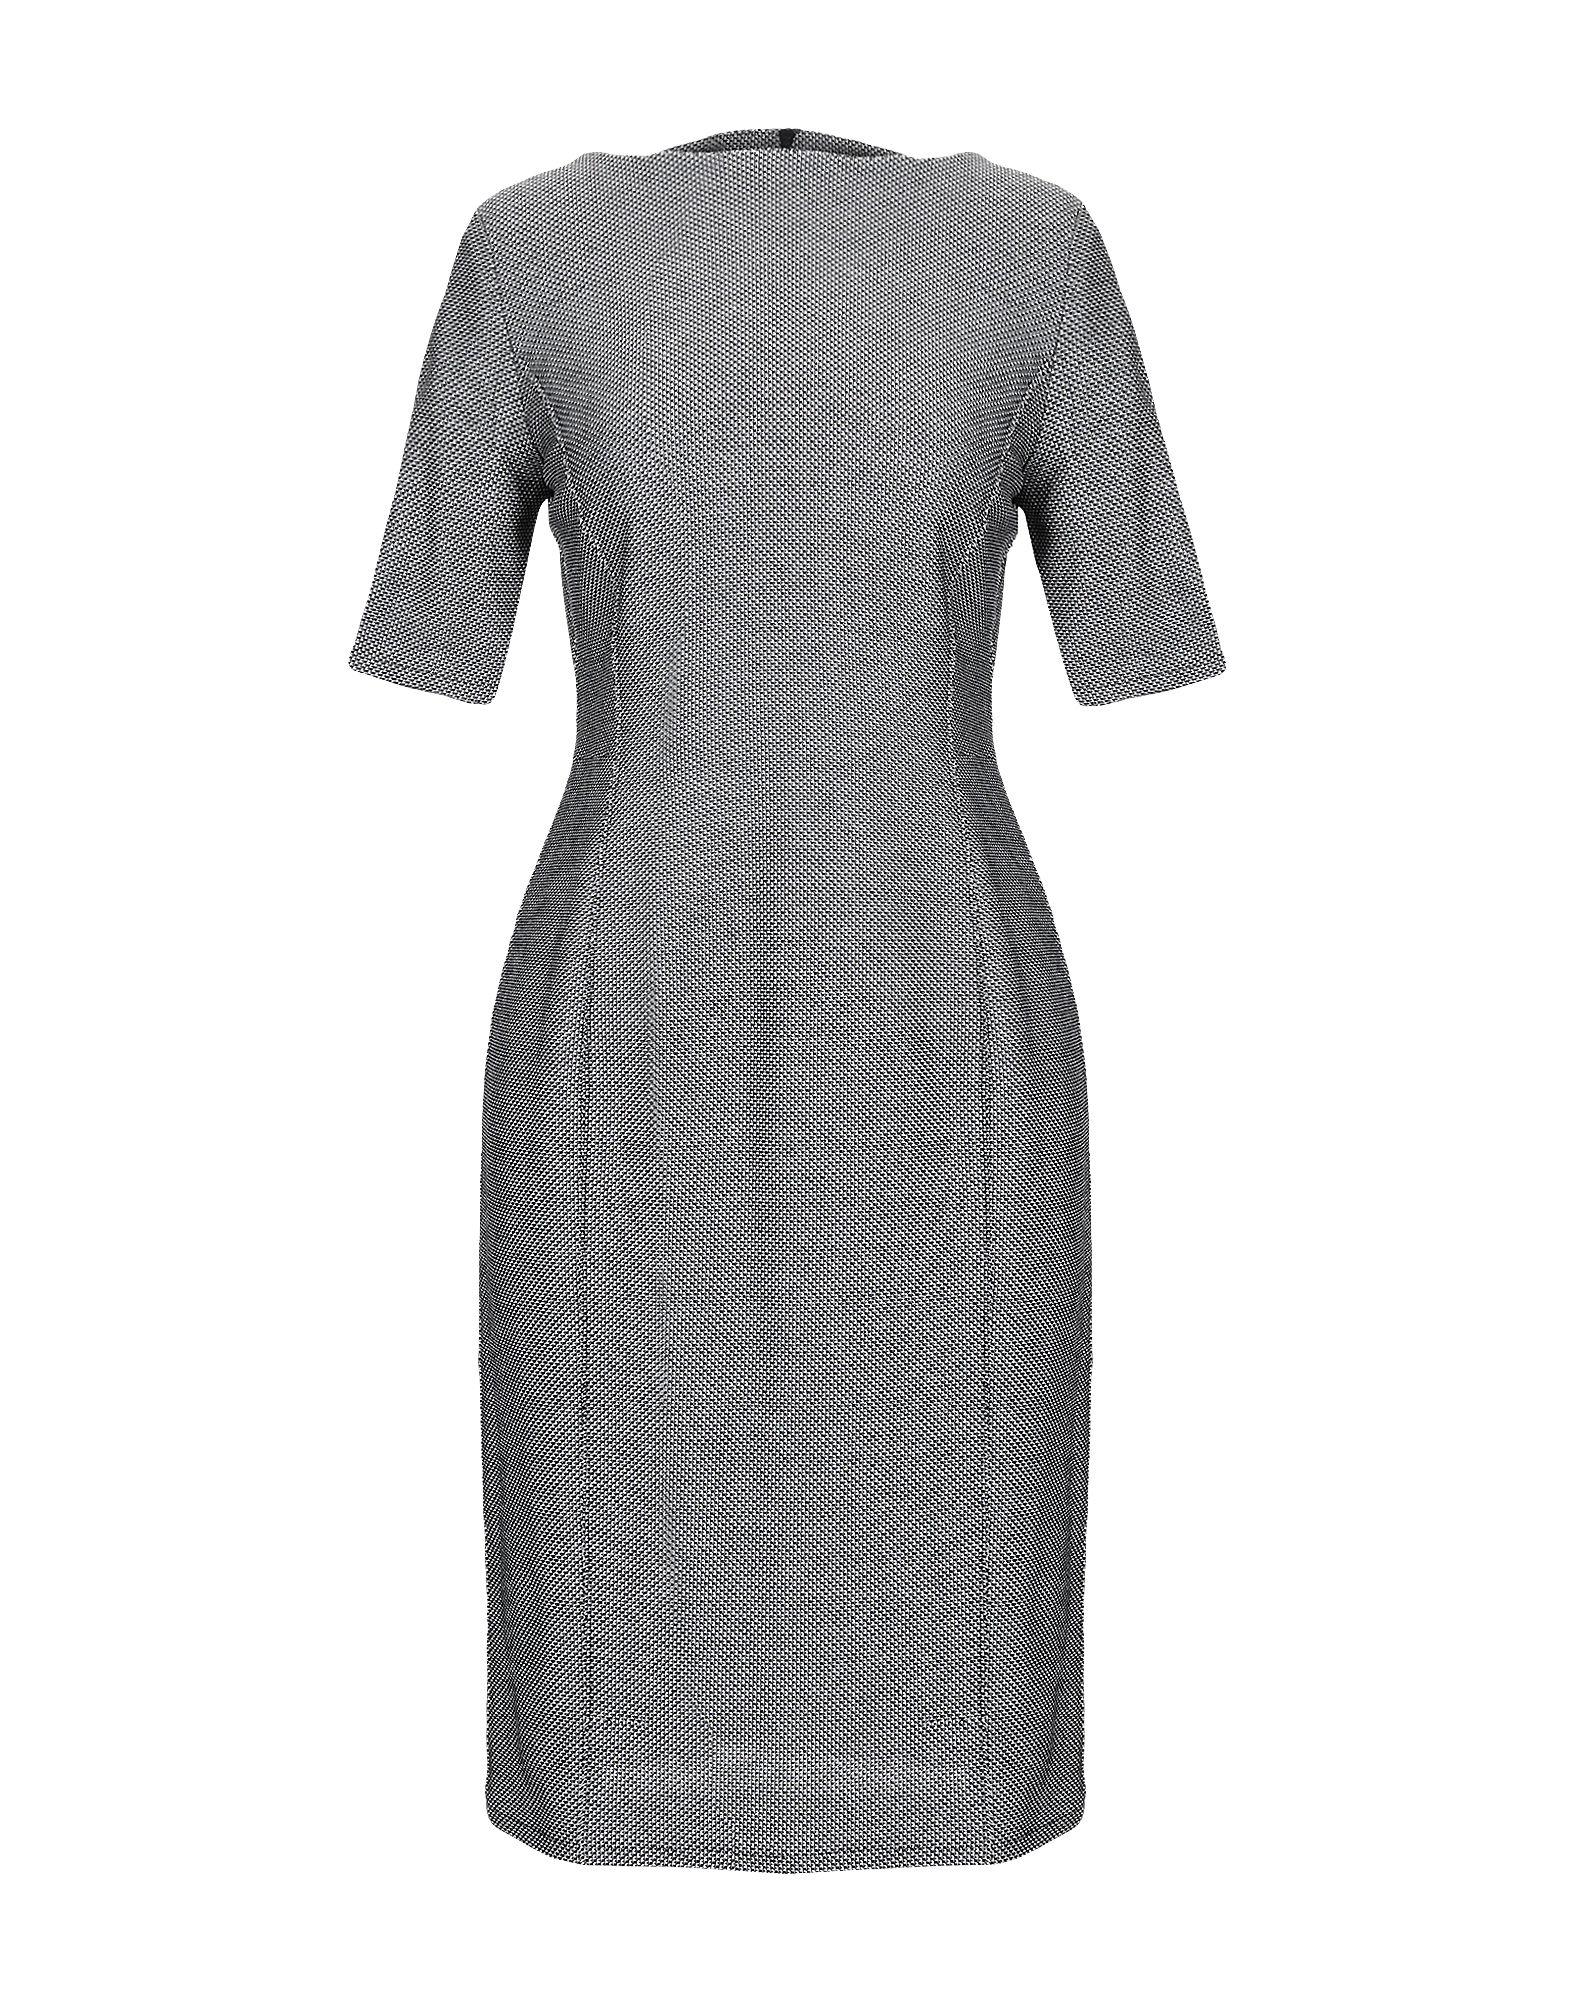 HARRIS WHARF LONDON Короткое платье